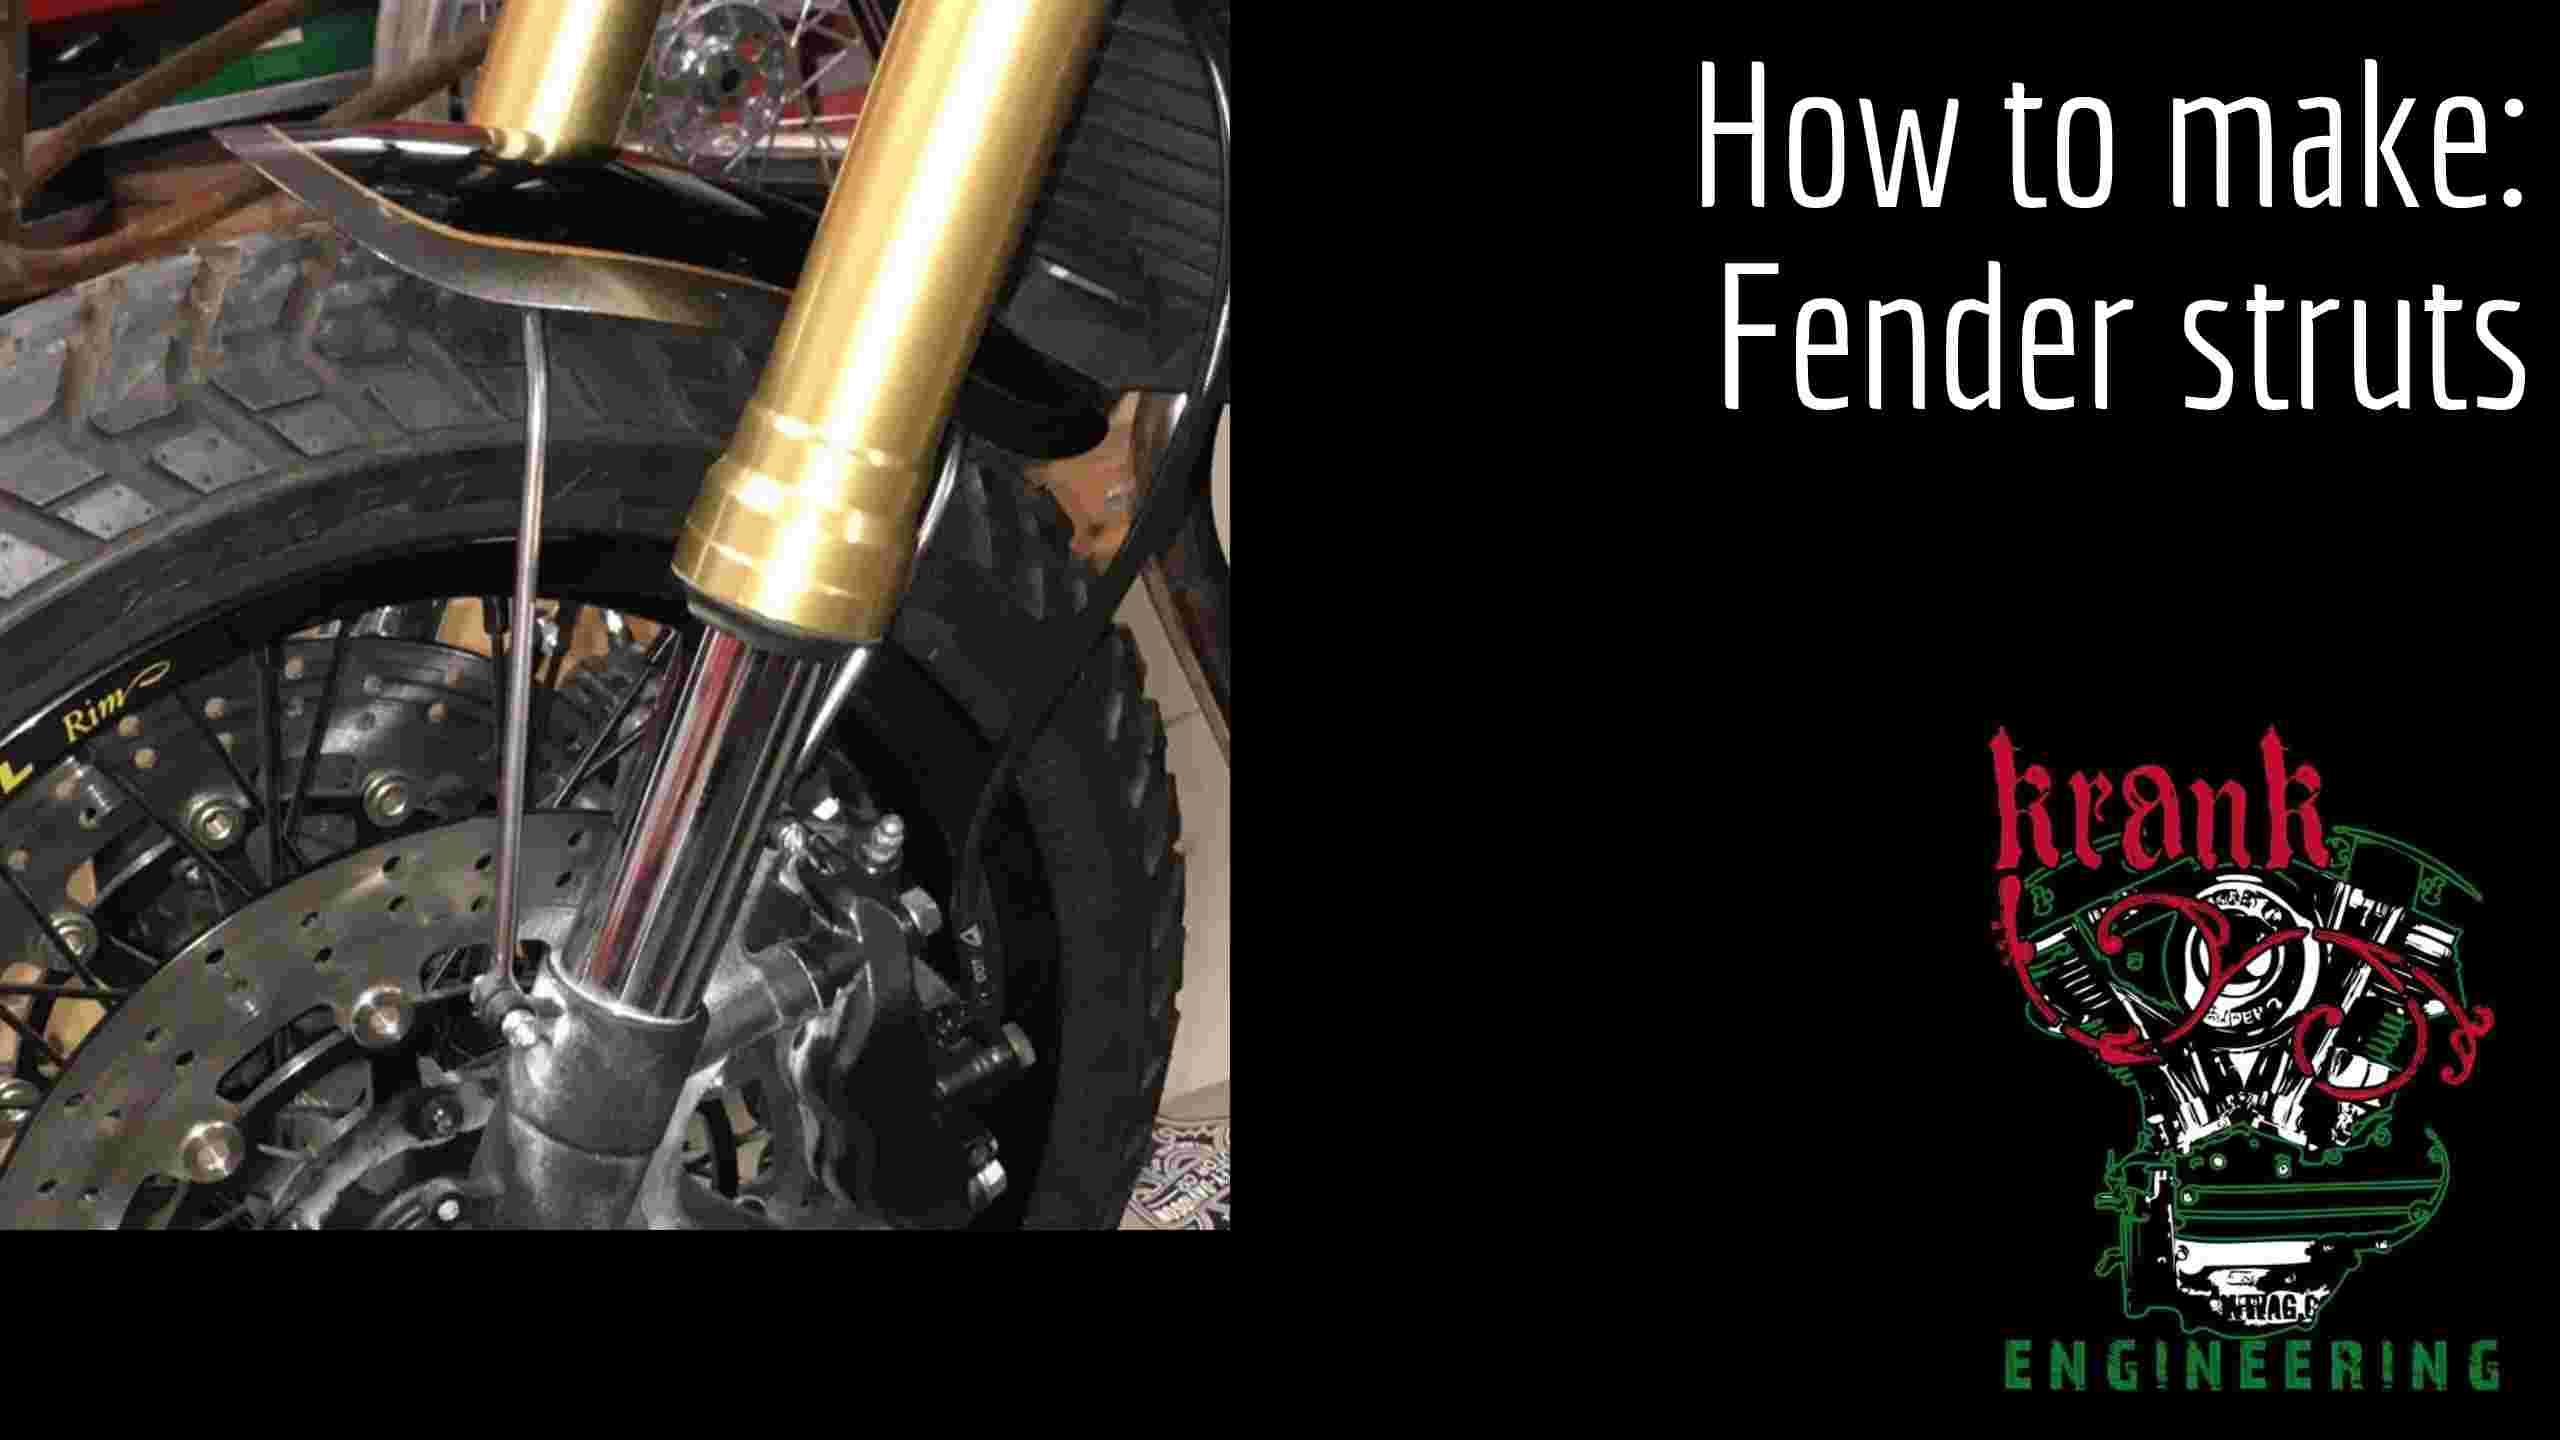 how to make fender struts or a sissy bar